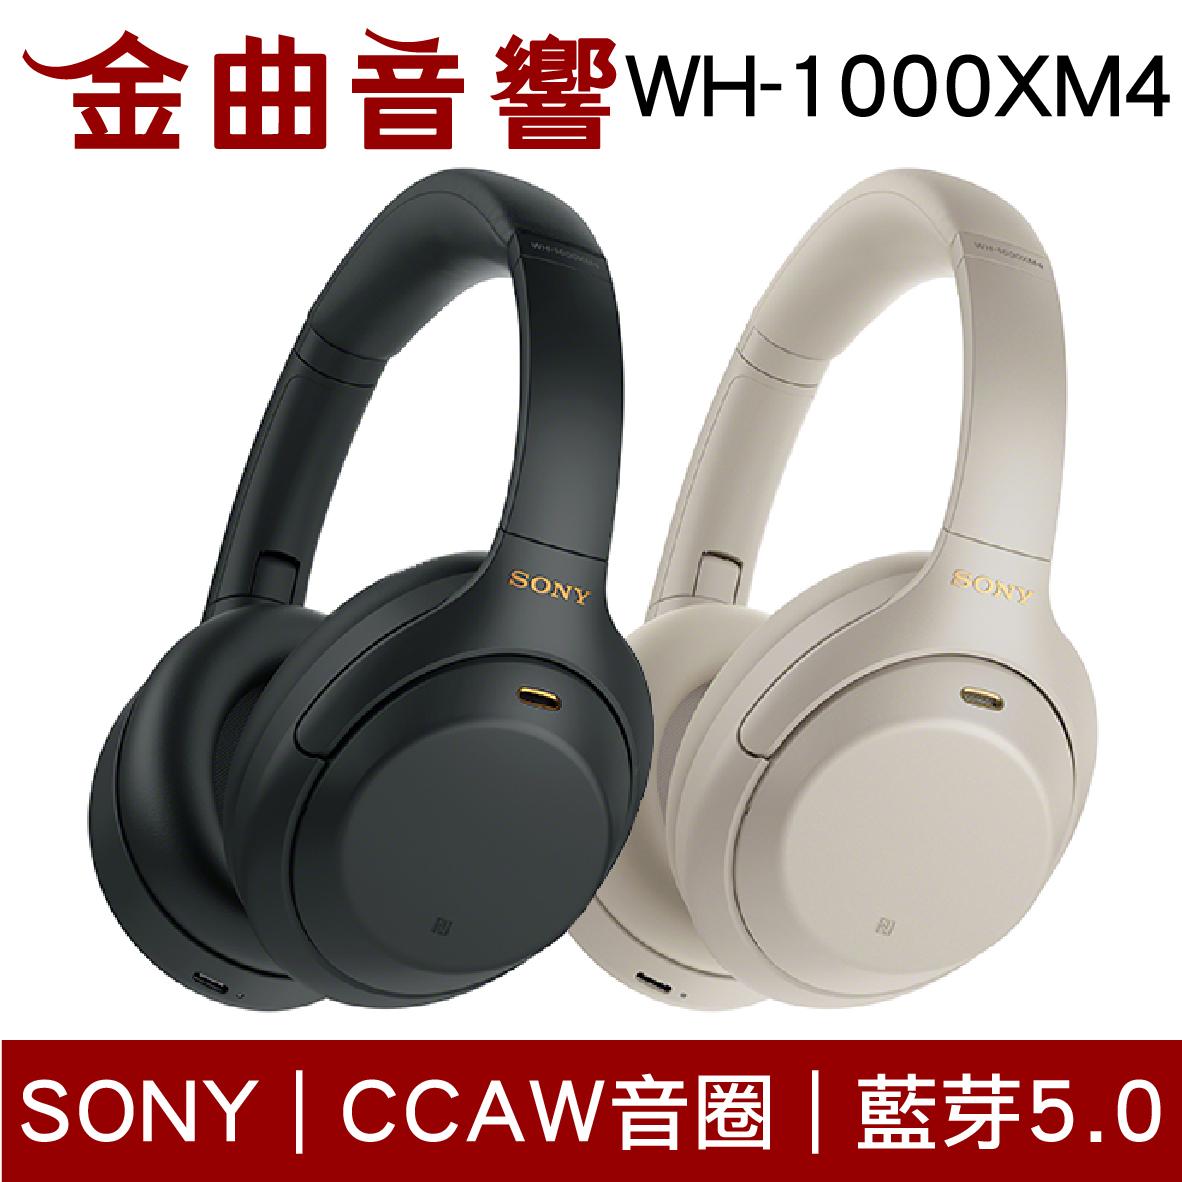 Sony 索尼 WH-1000XM4 銀 免持 通話 語音助理 藍芽 無線 降噪 耳機 | 金曲音響